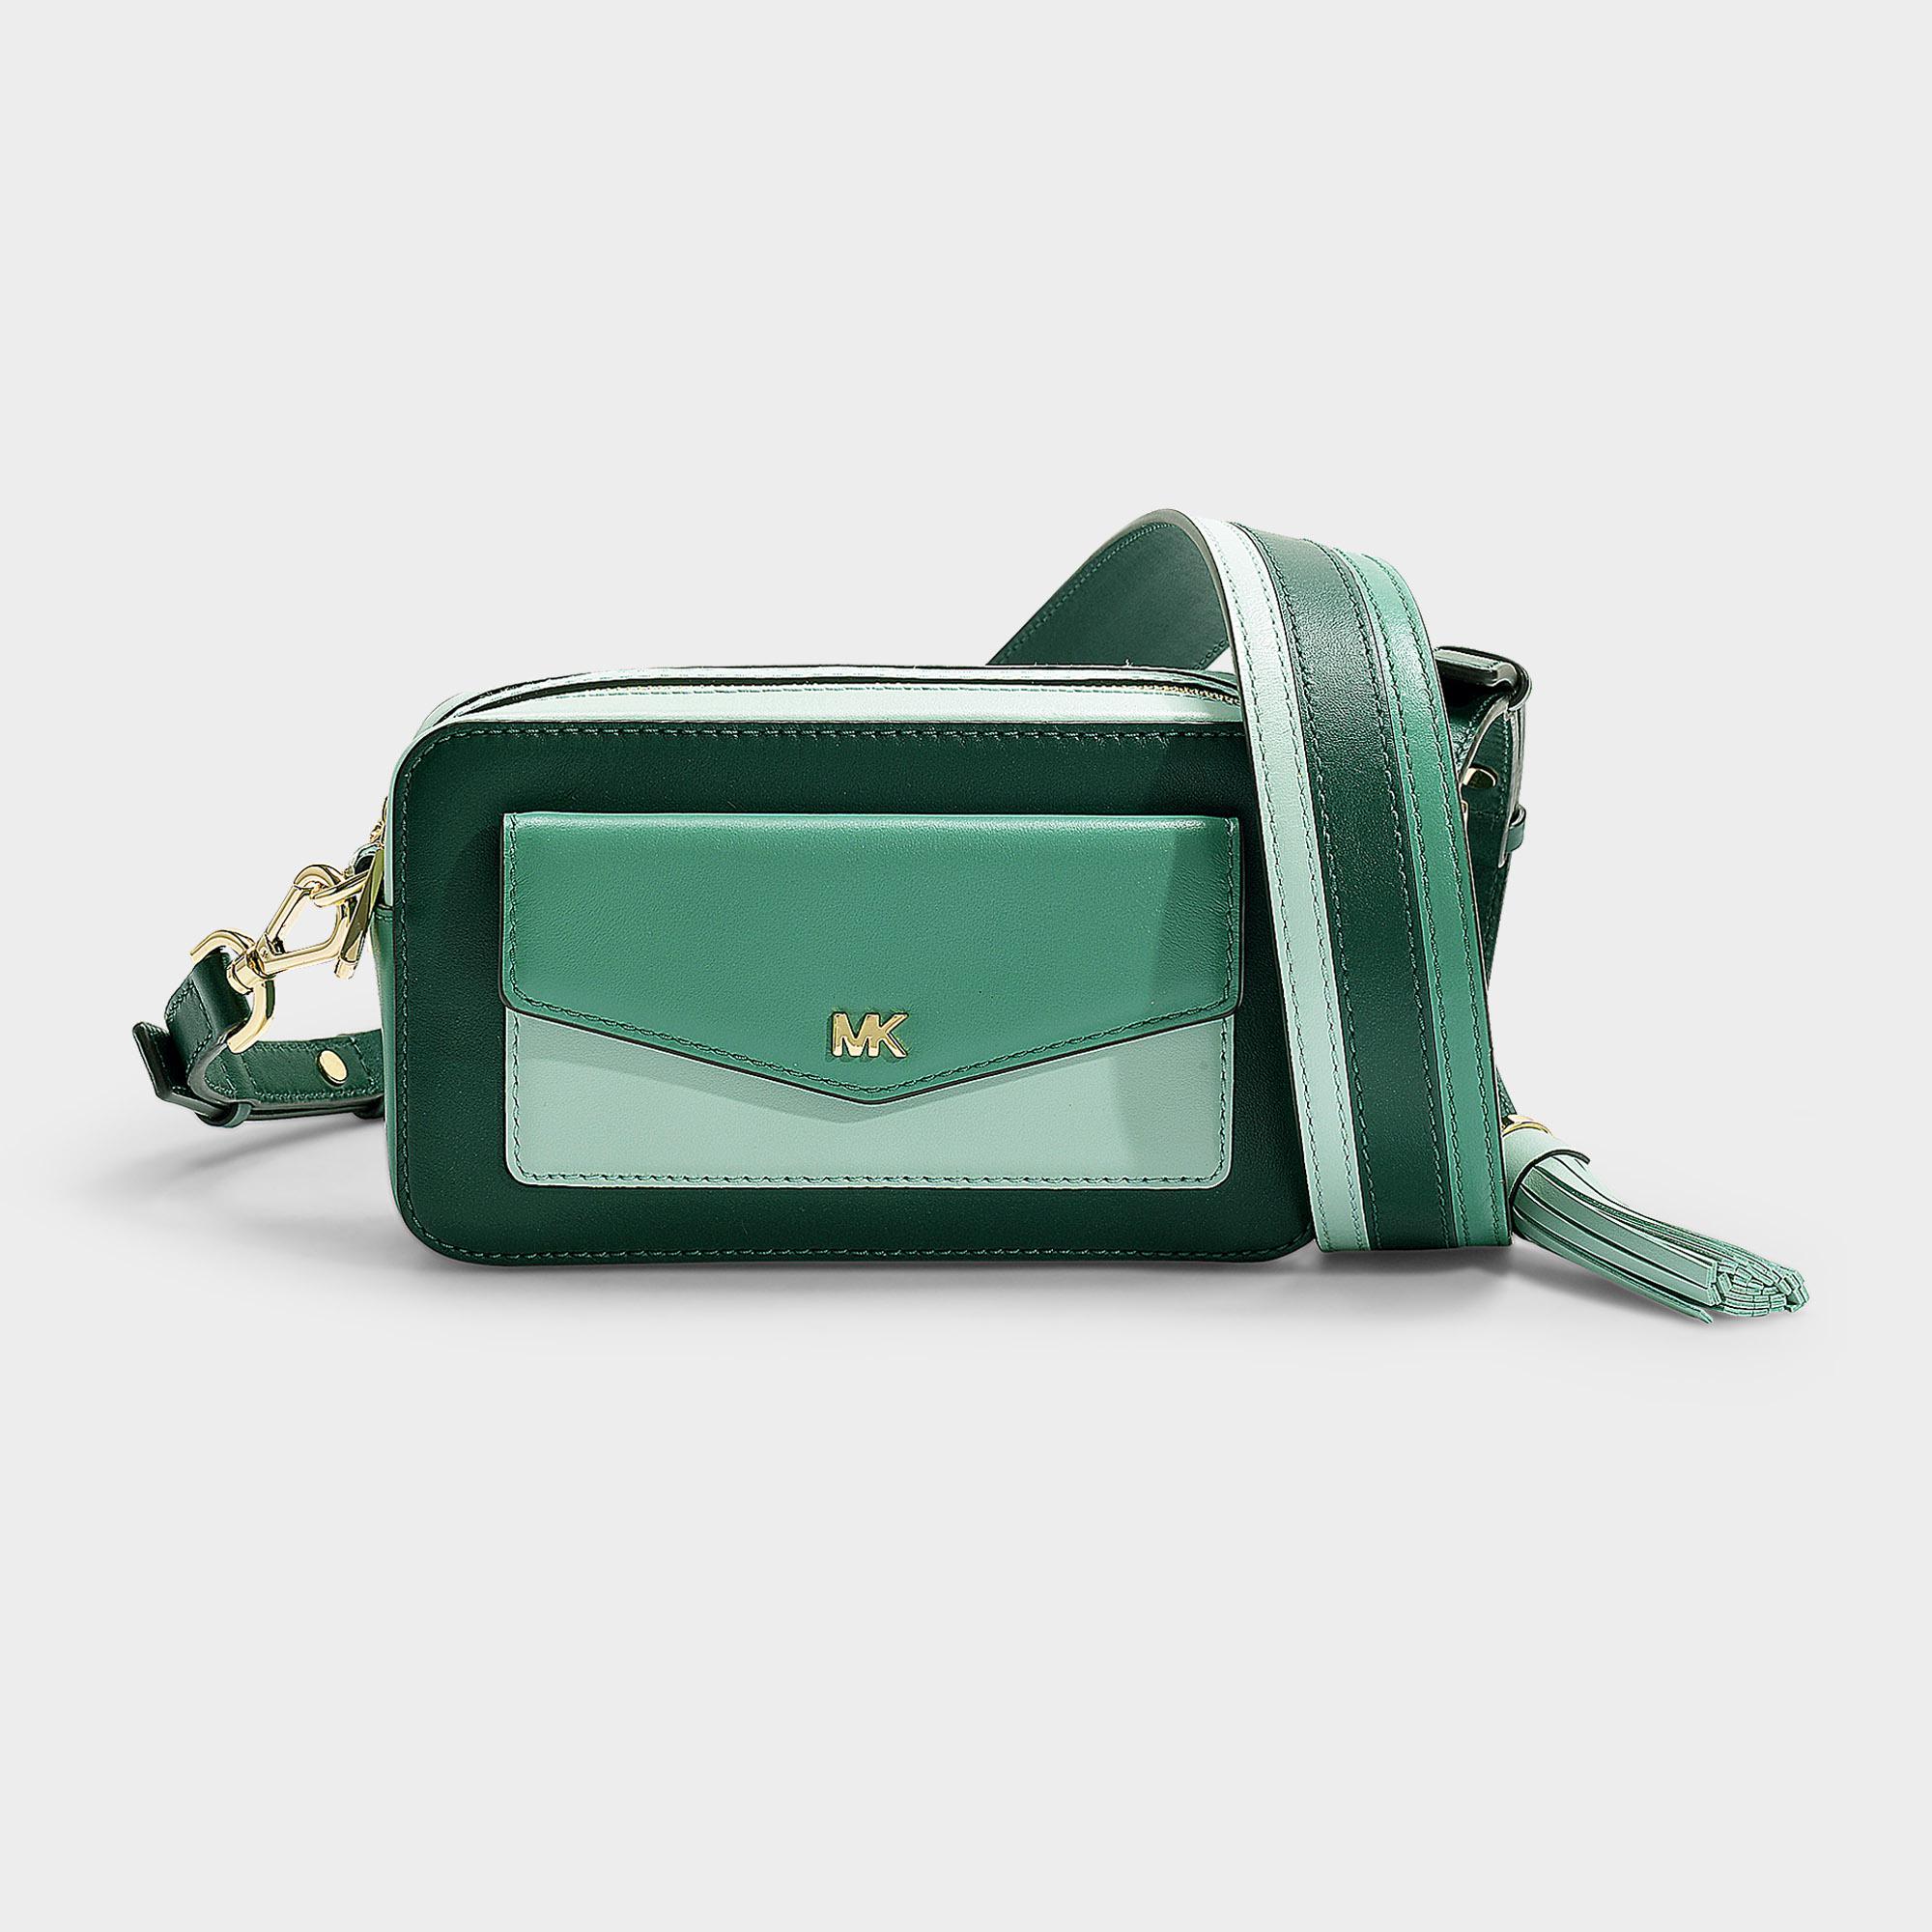 daa4c4e59c62 Lyst - MICHAEL Michael Kors Crossbodies Small Pocket Camera Bag In ...